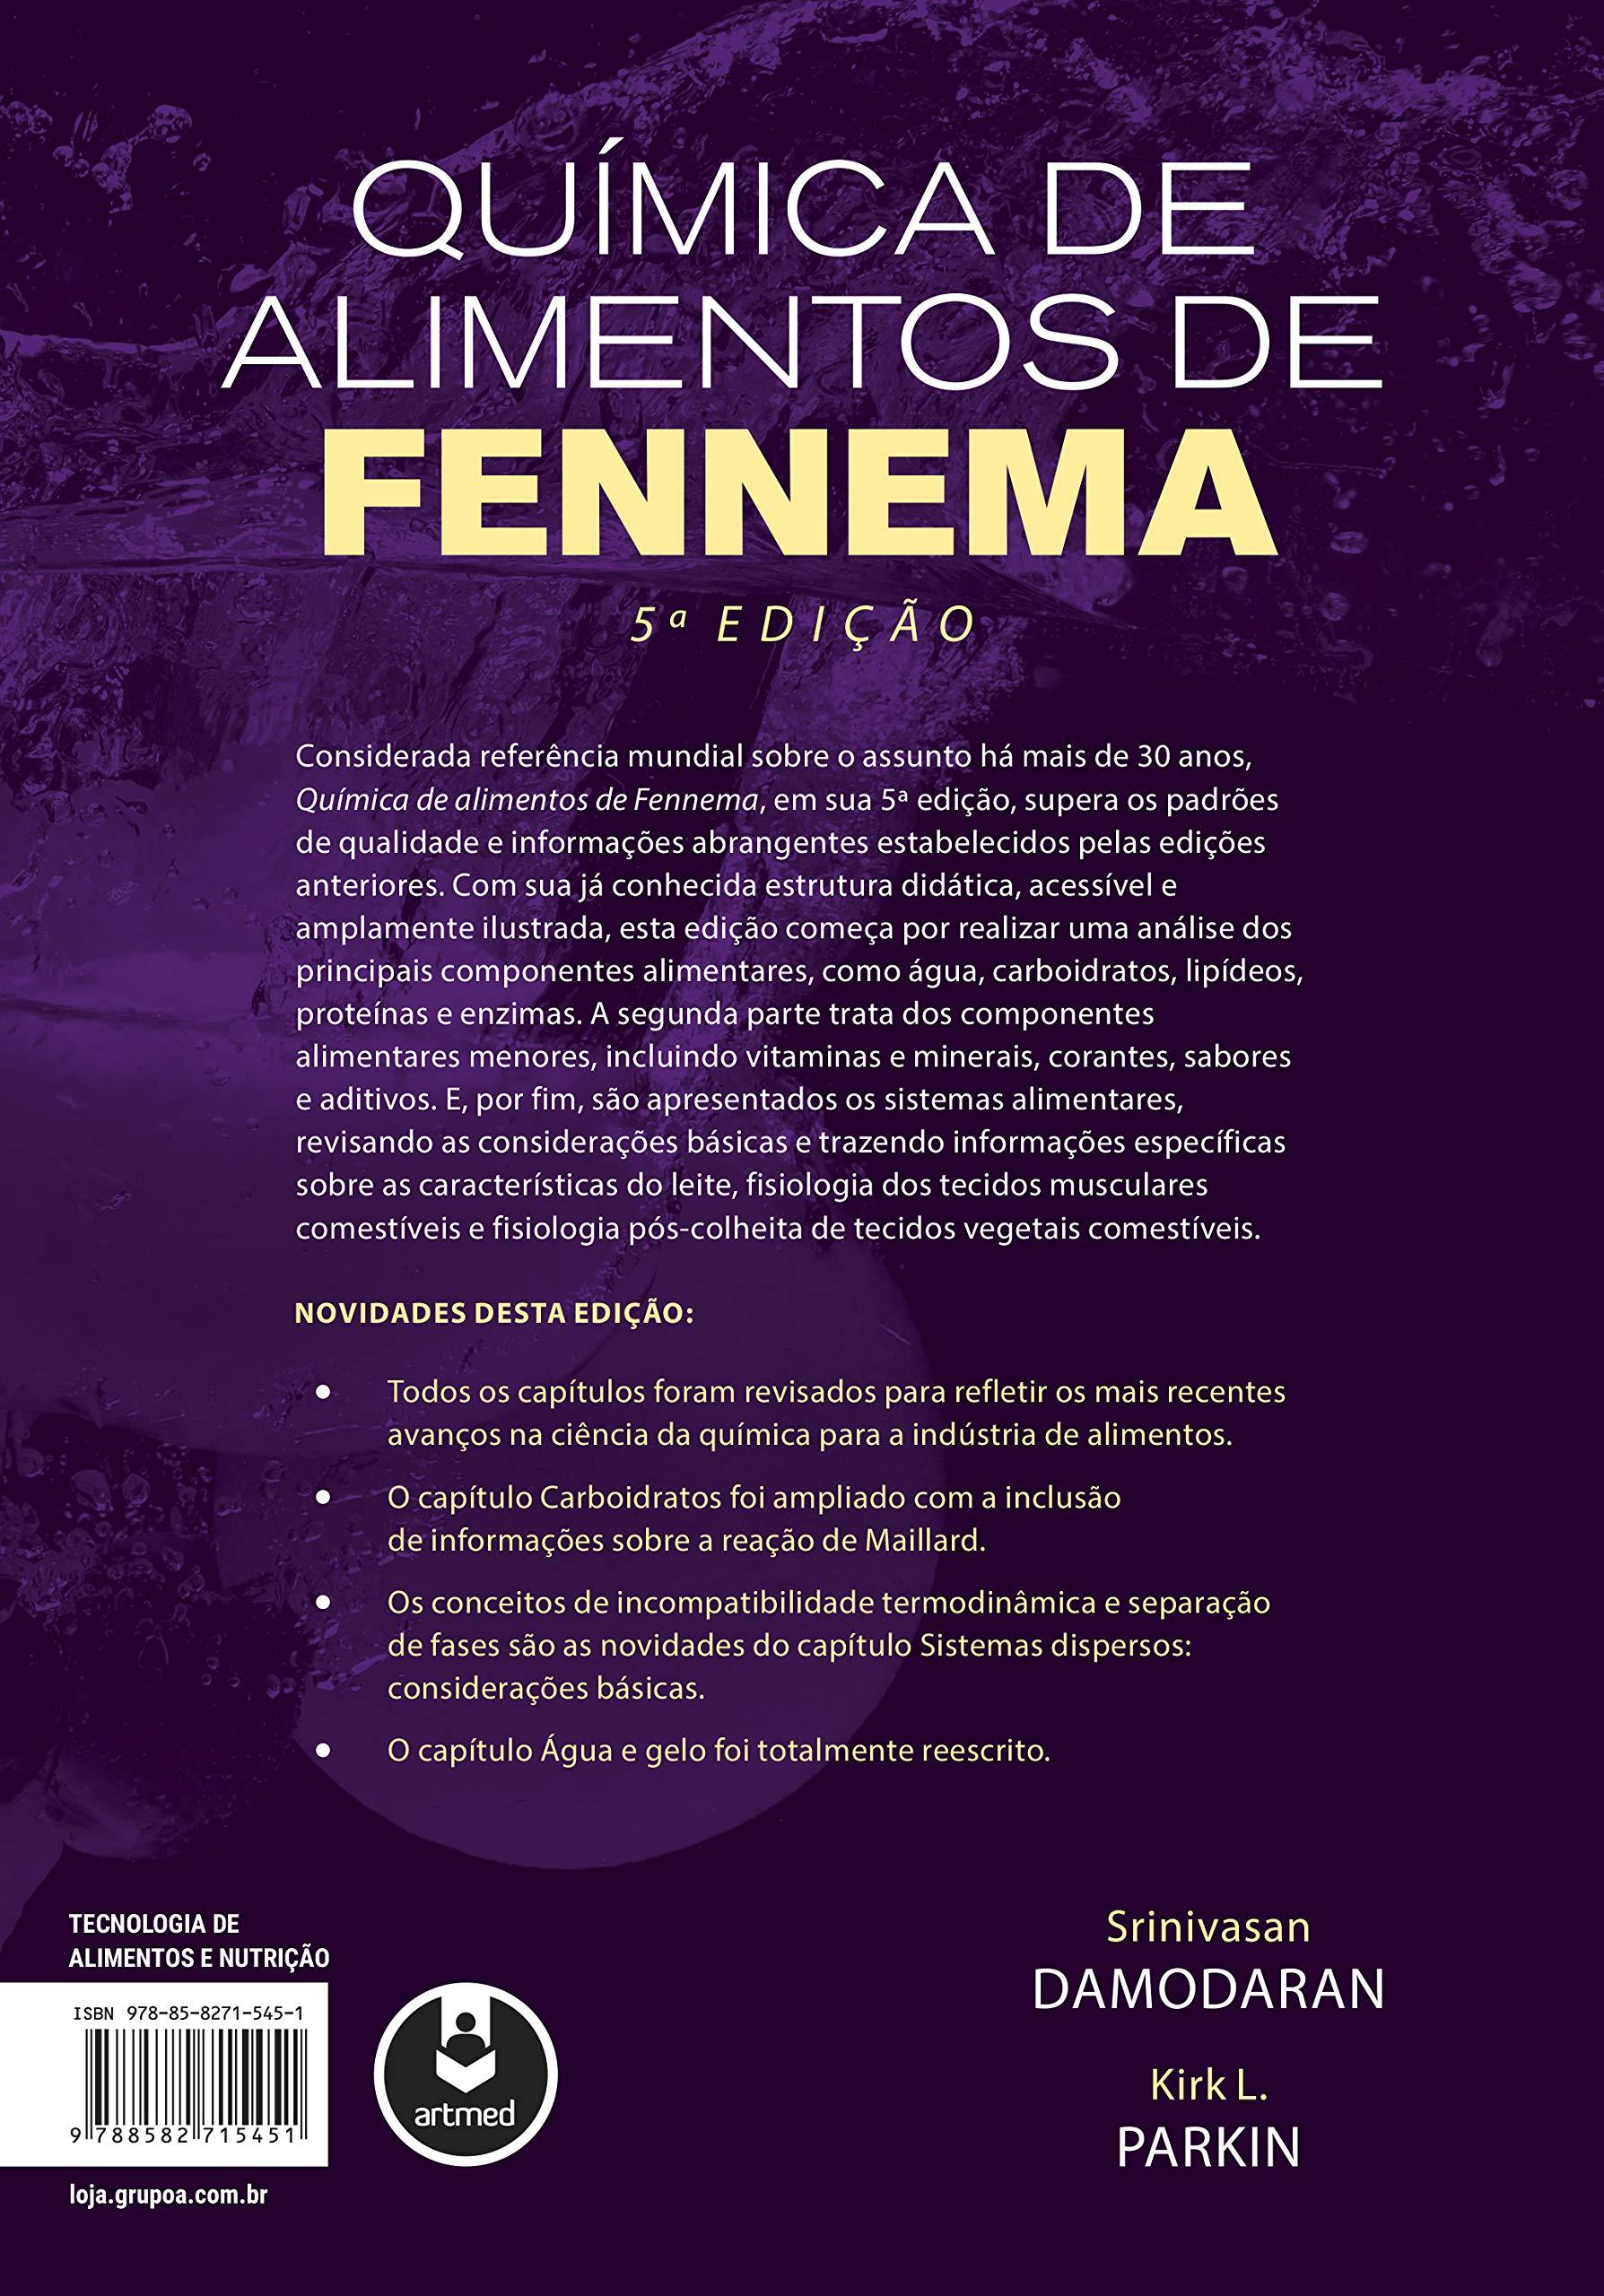 Química de Alimentos de Fennema: Srinivasan Damodaran: 9788582715451 ...